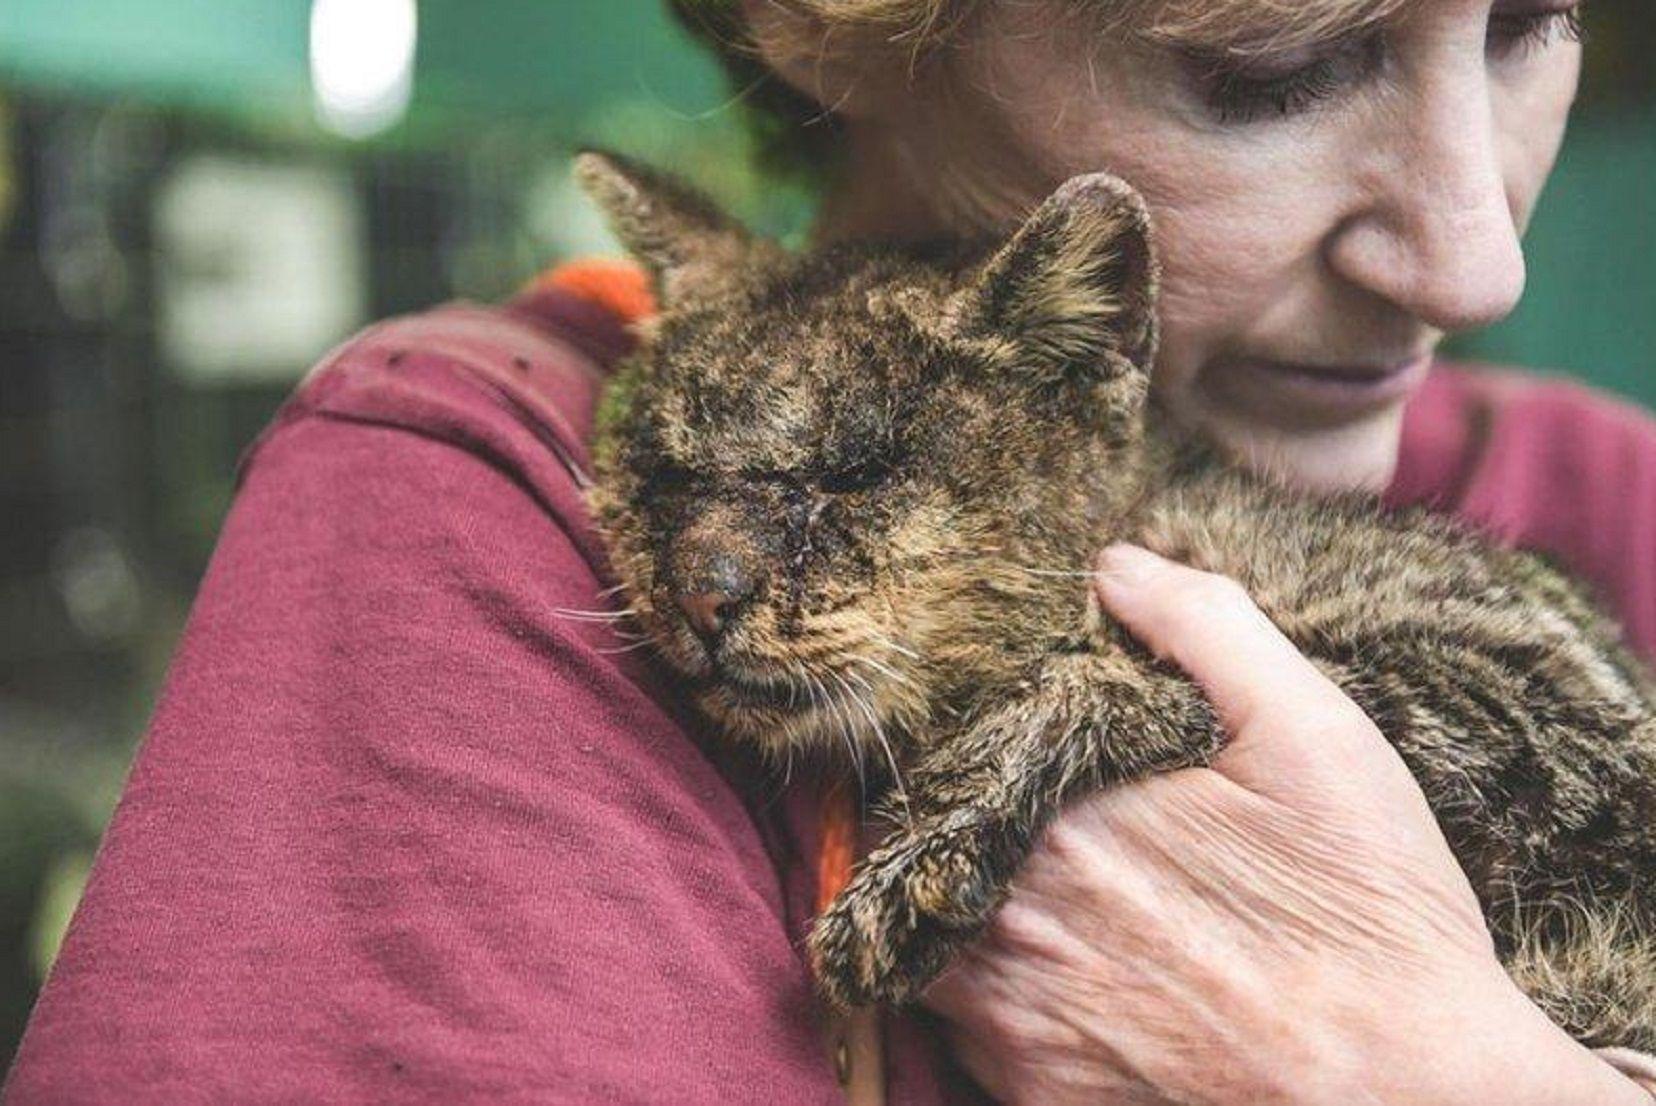 Donaciones salvaron a un gato moribundo